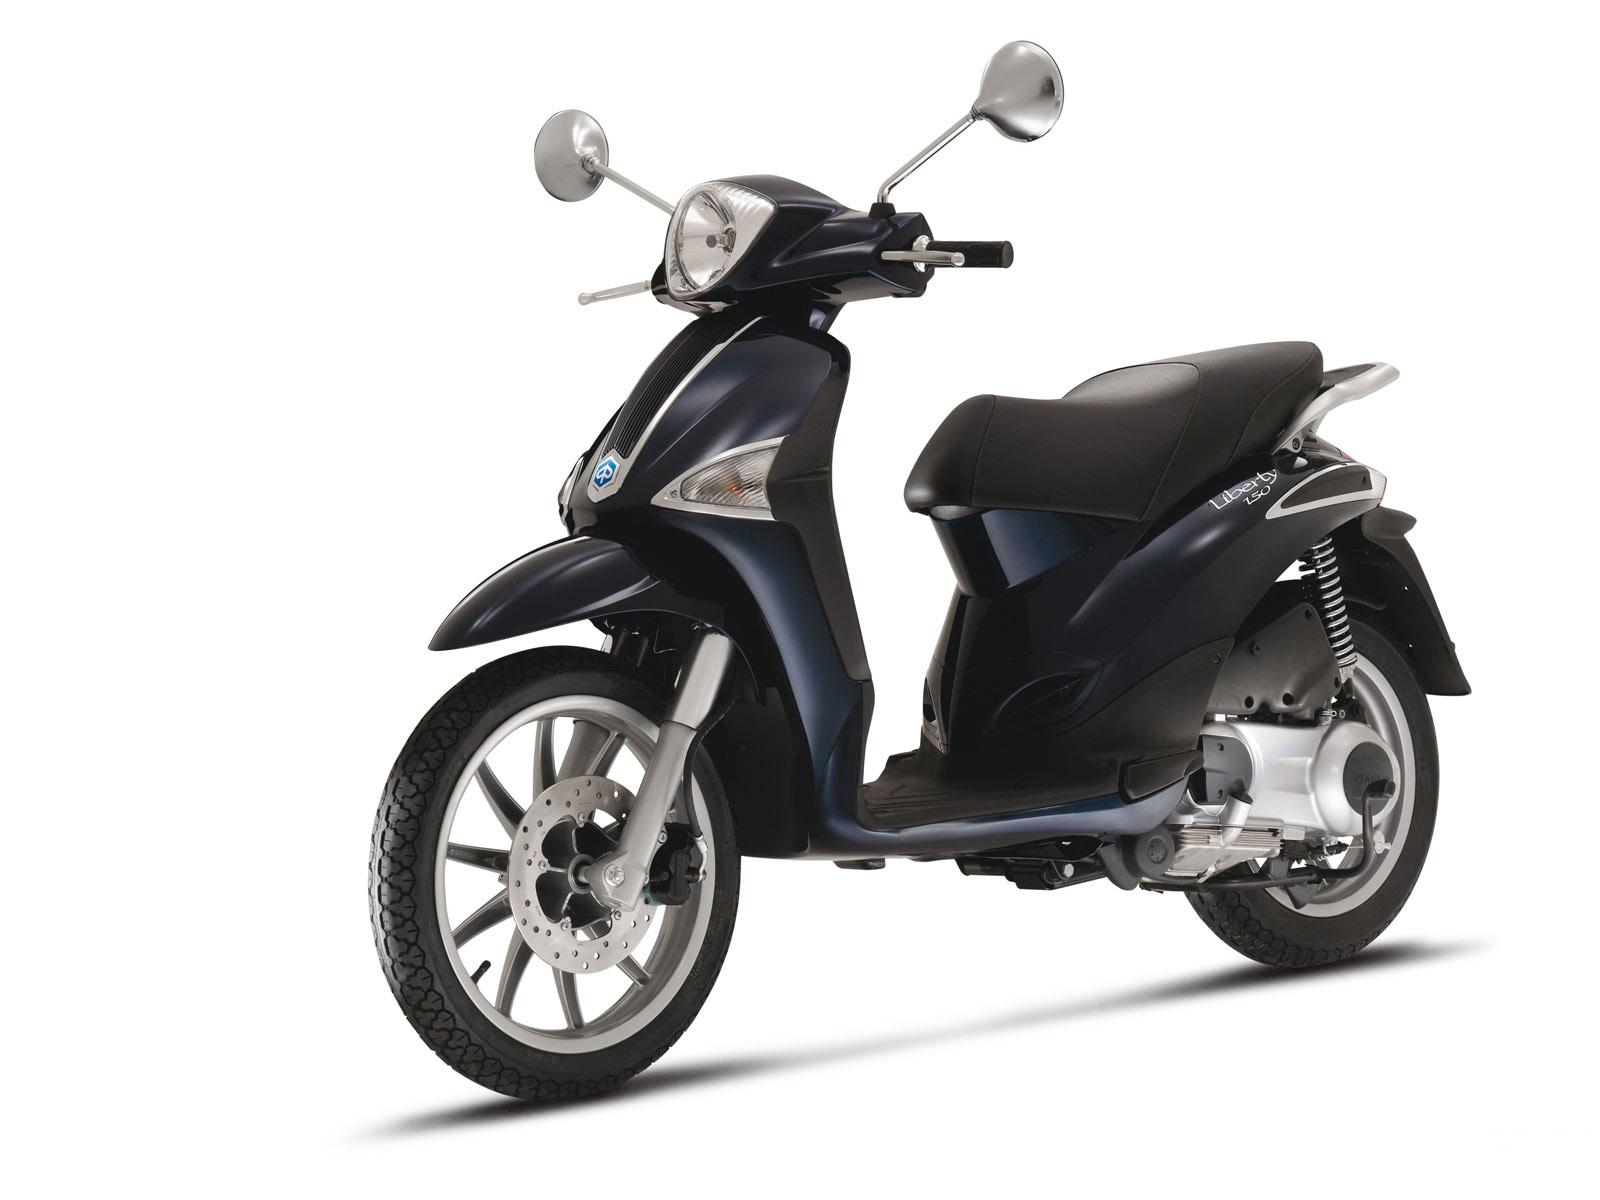 piaggio 125 cc scooters. Black Bedroom Furniture Sets. Home Design Ideas